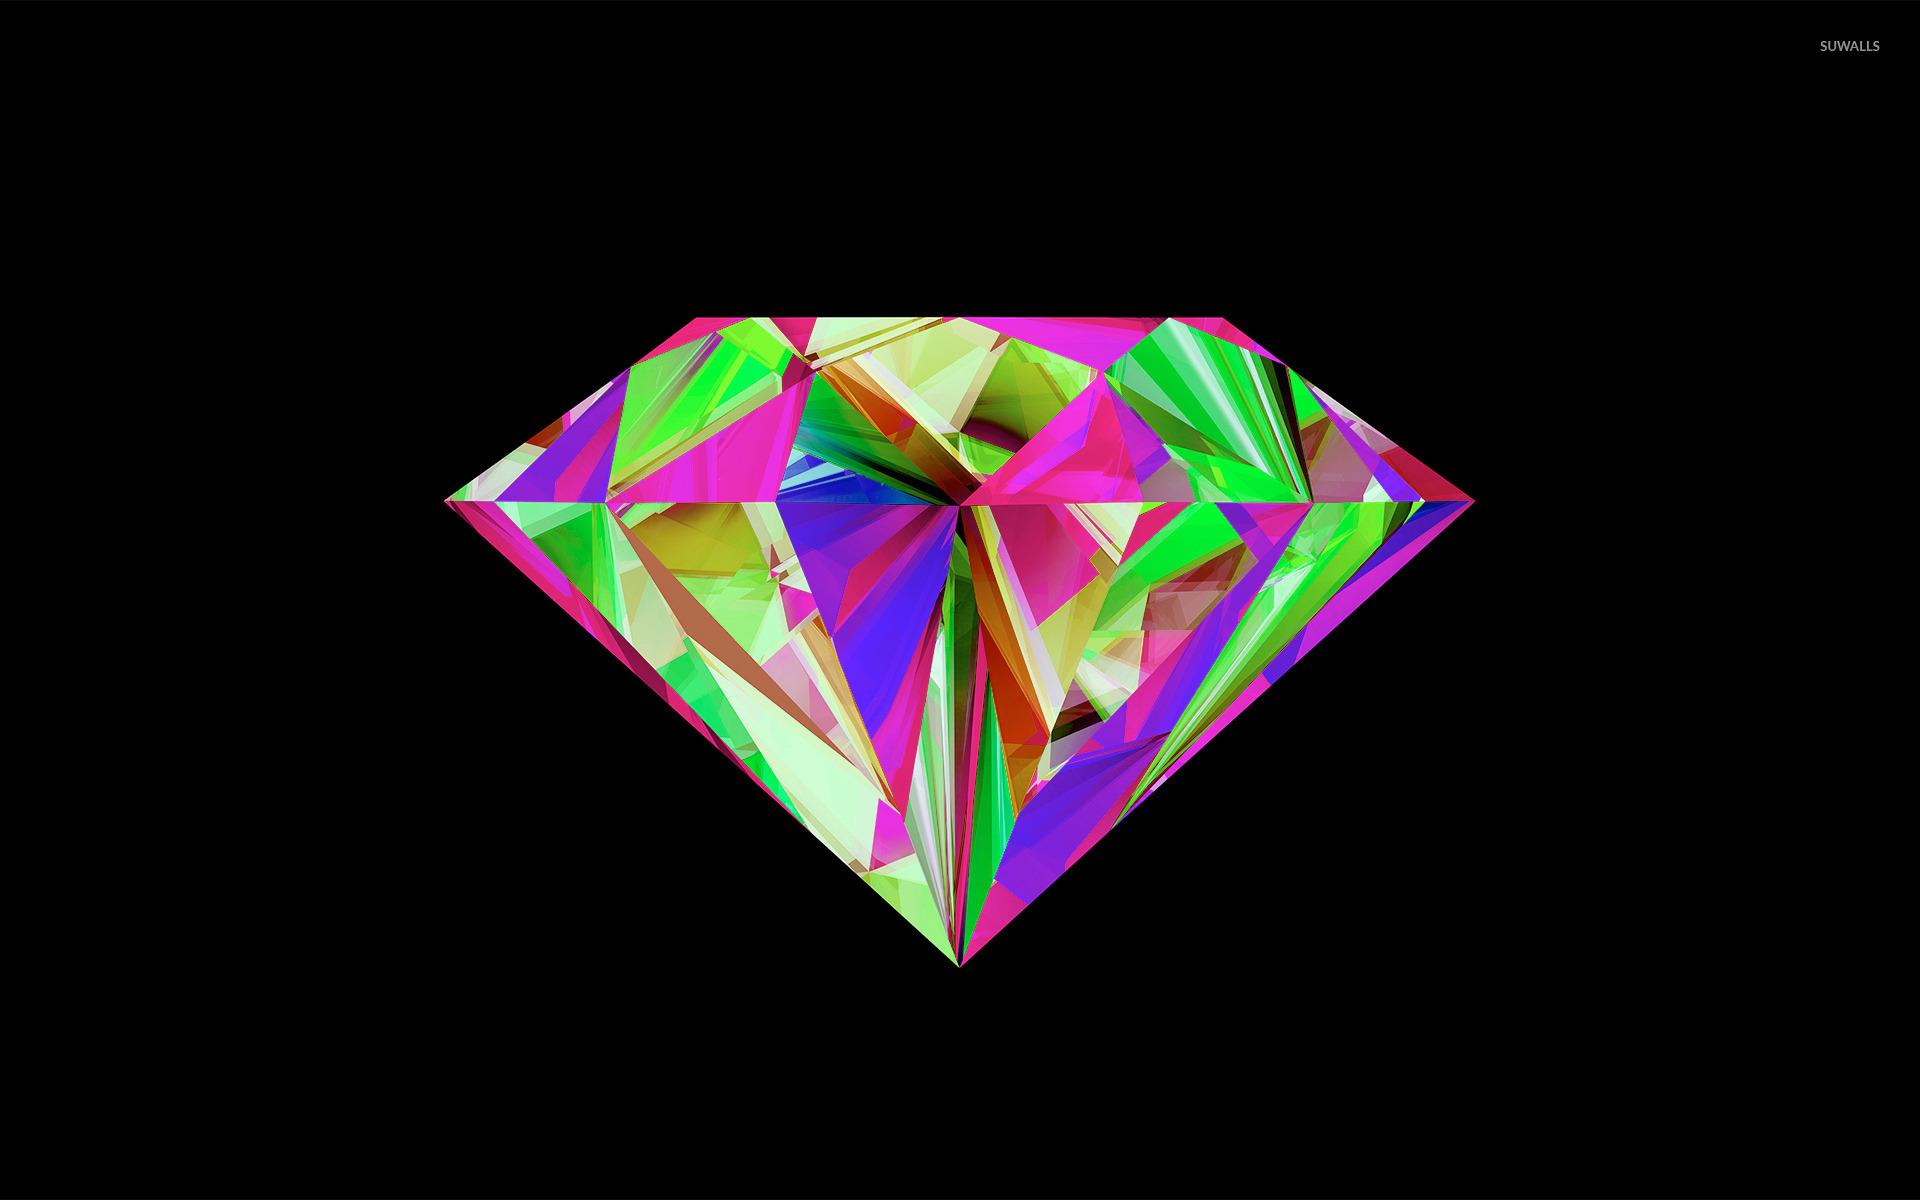 Fall Desktop Mountain Wallpaper Colorful Diamond Wallpaper Vector Wallpapers 31520